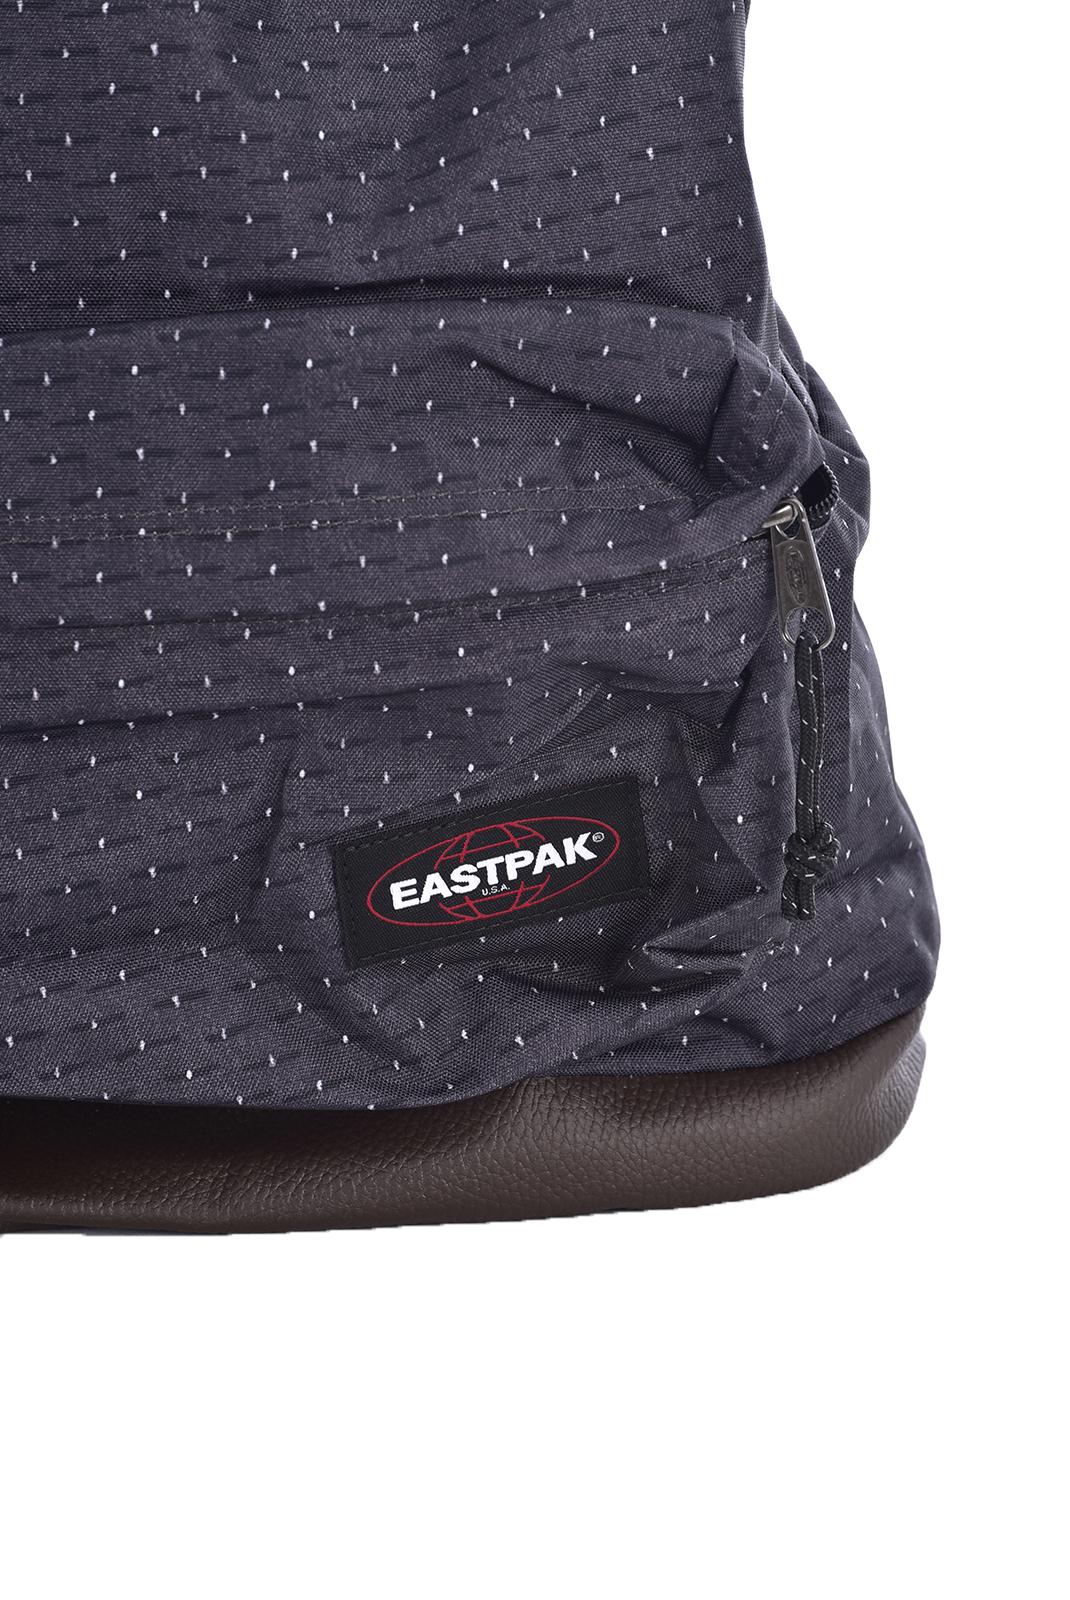 Sacs à dos  Eastpak EK81139T  39t stitch dot